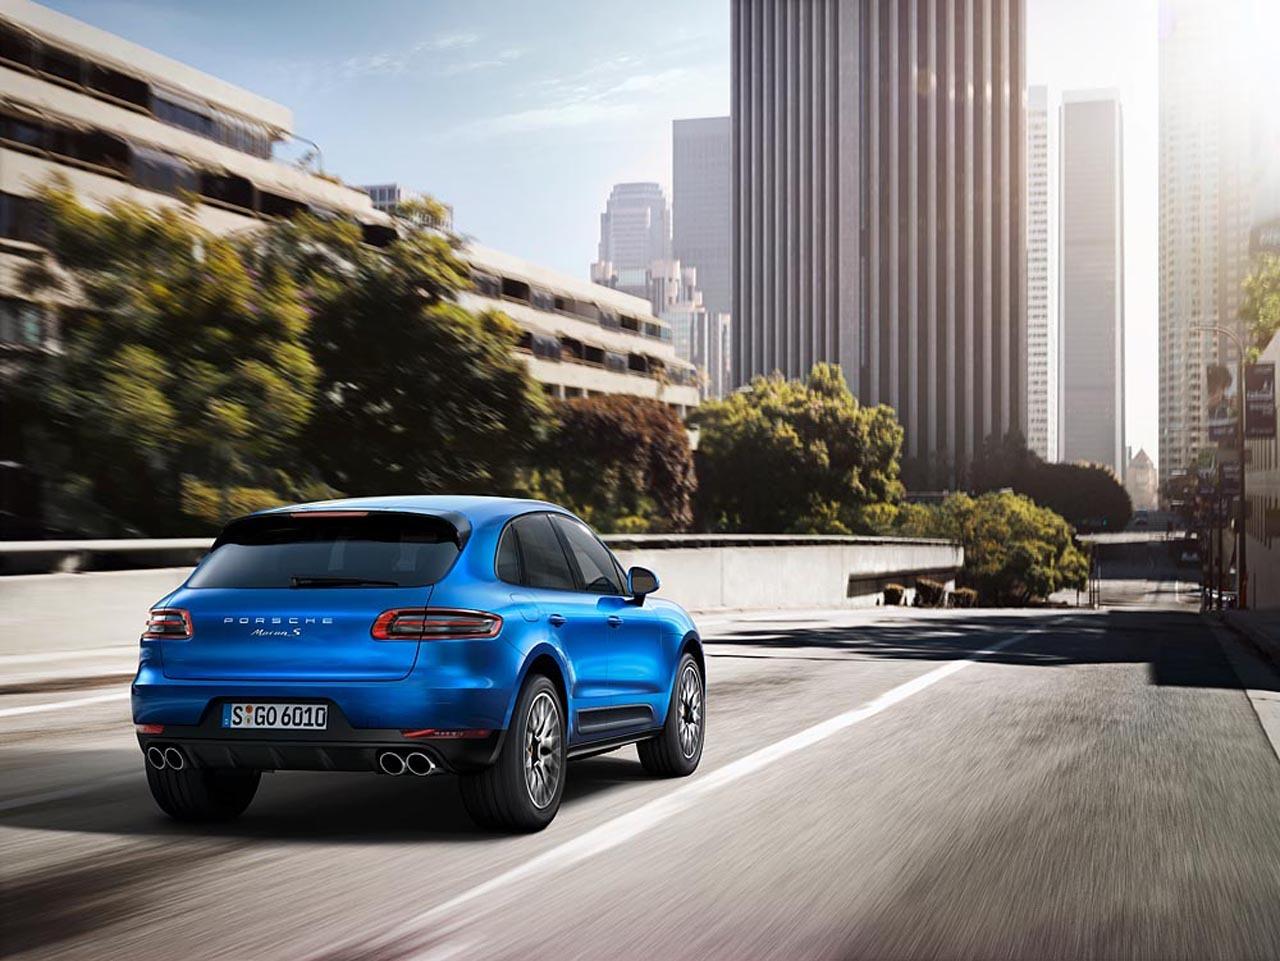 Se acabó la espera, ya está aquí el Porsche Macan